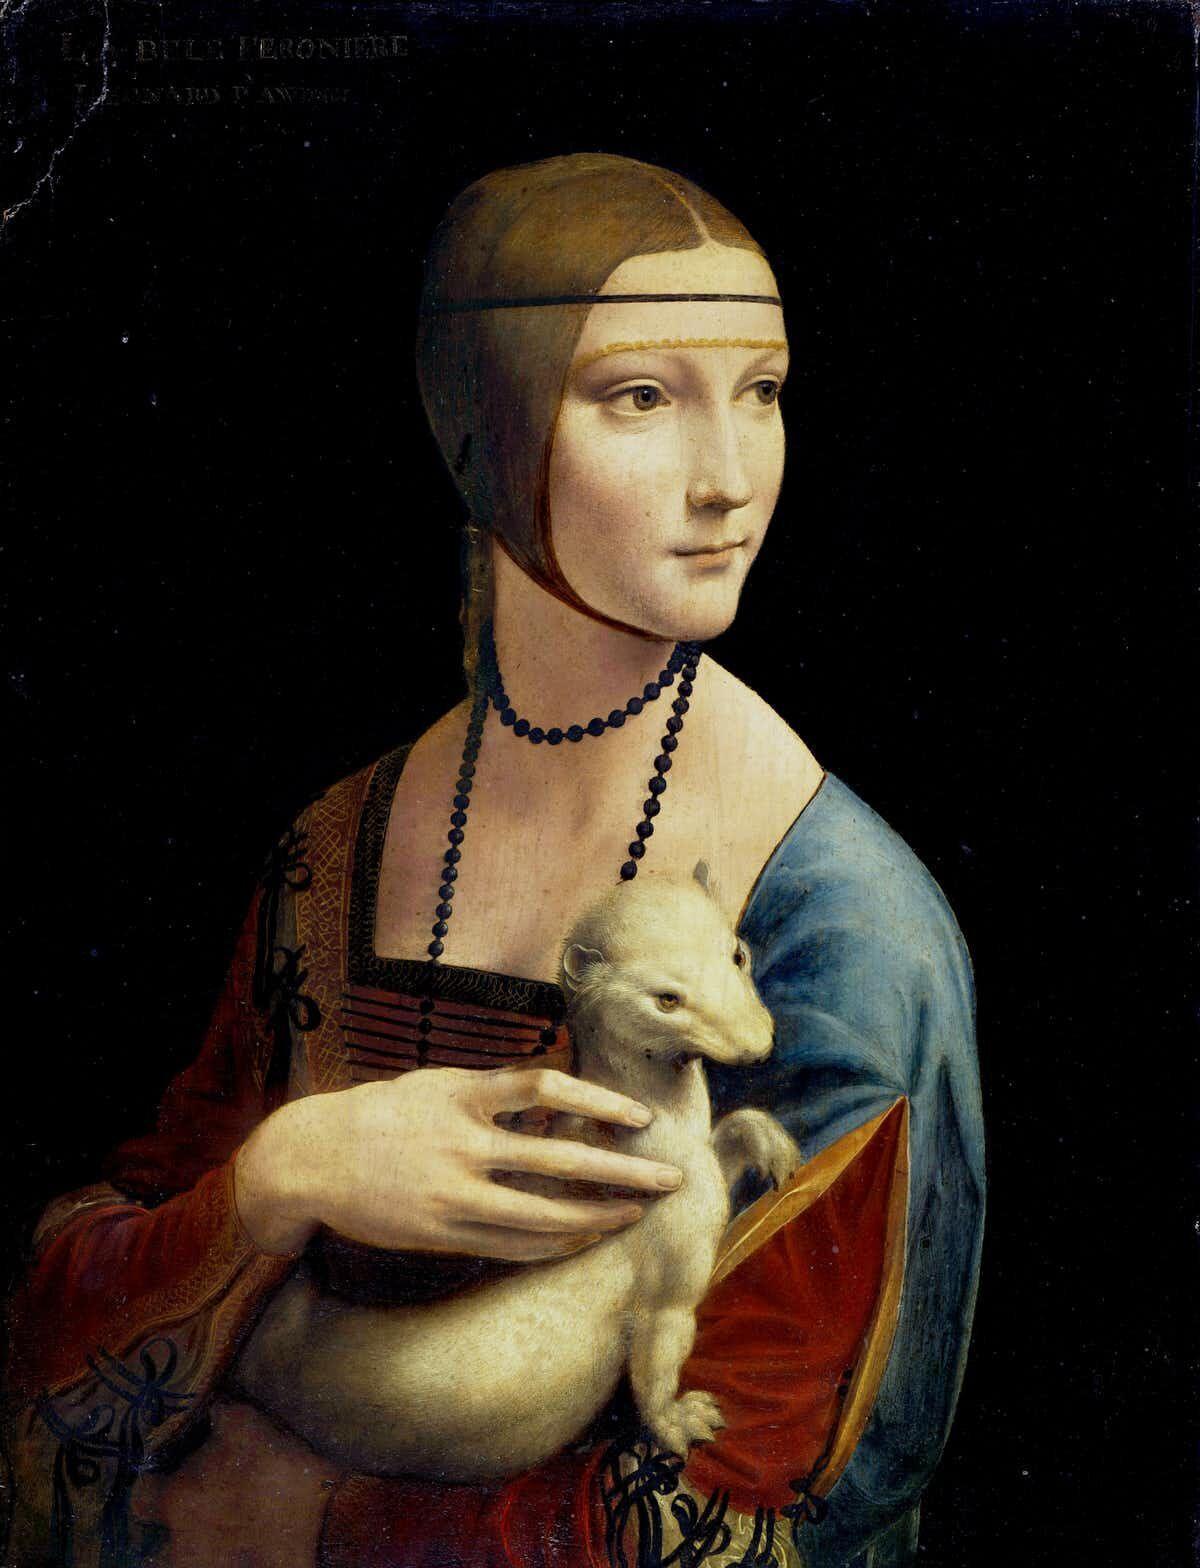 Leonardo da Vinci, Lady with an Ermine, 1489–90. Image via Wikimedia Commons.